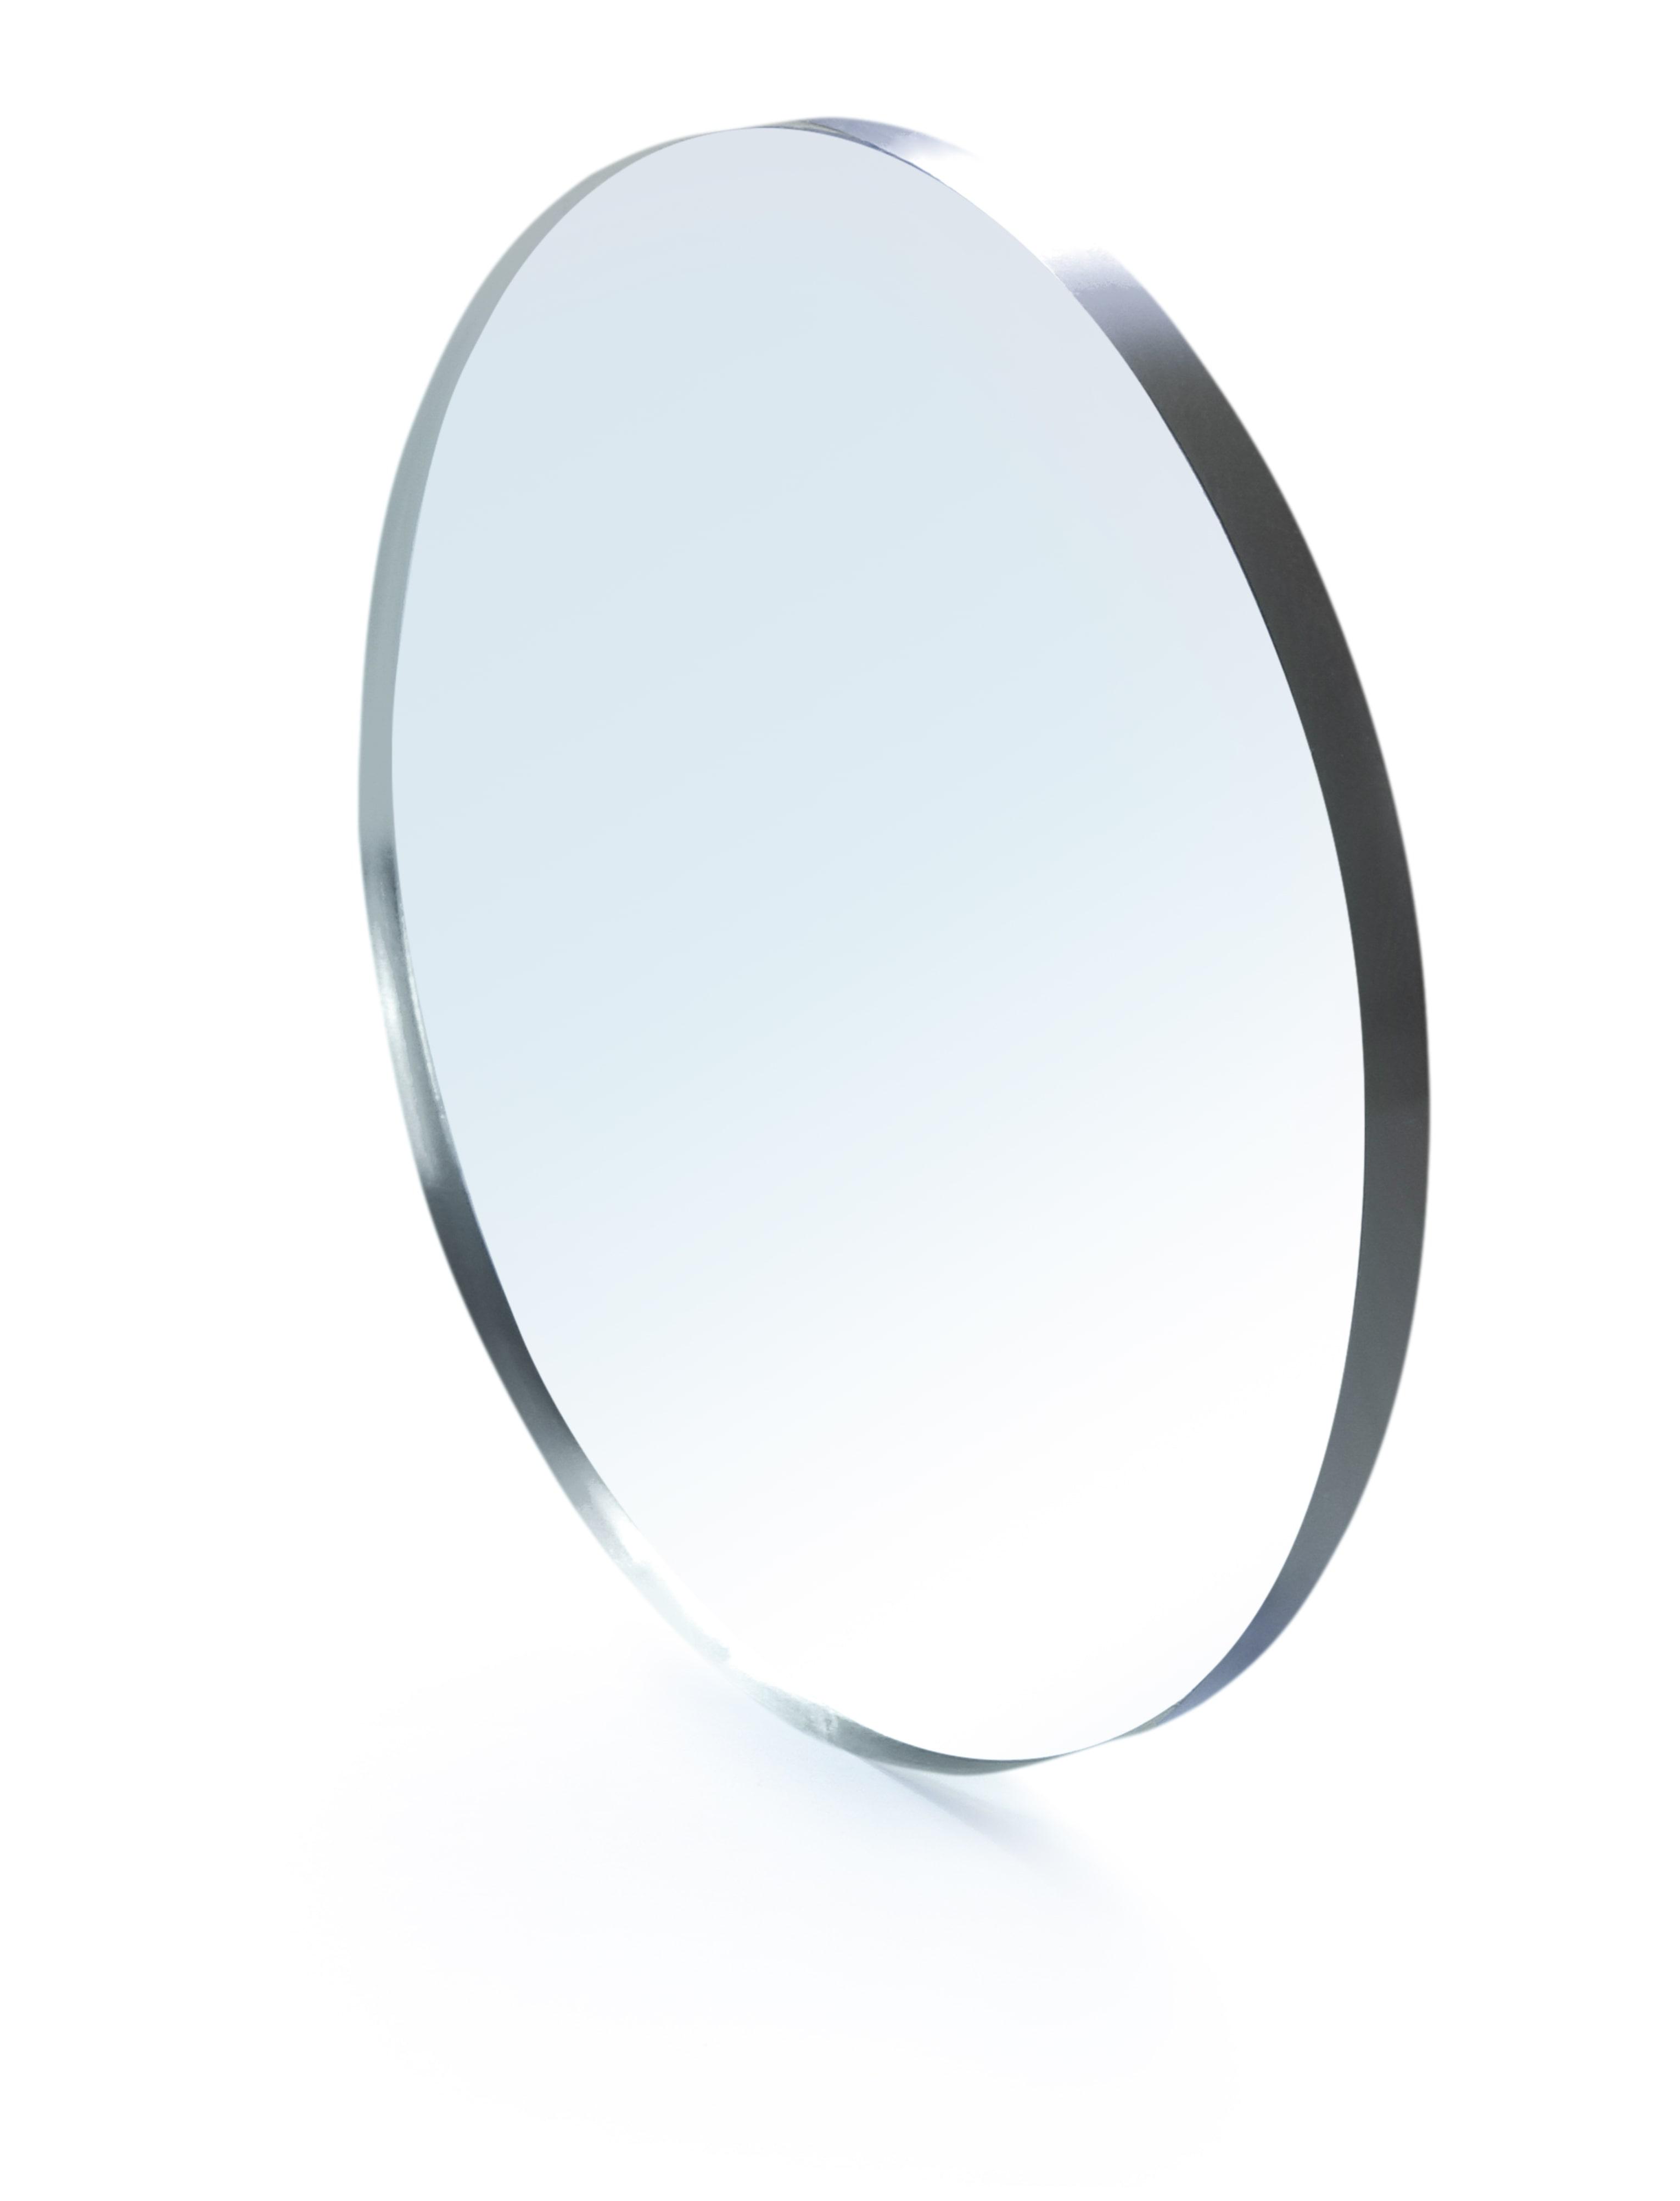 High Index Lens, Thinest Option